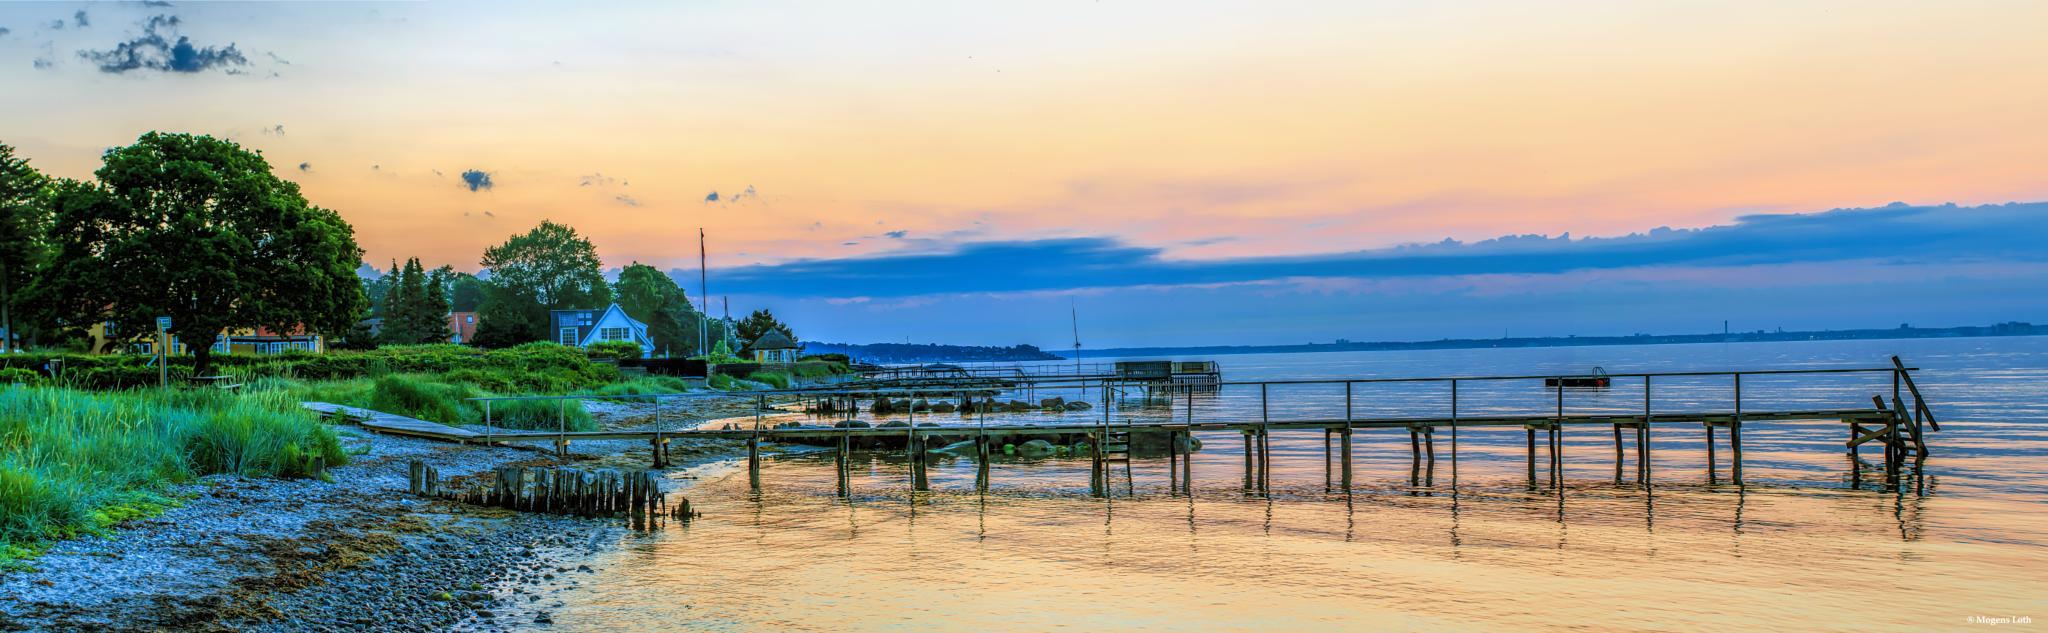 Sunrise over Oeresund by M. Loeth